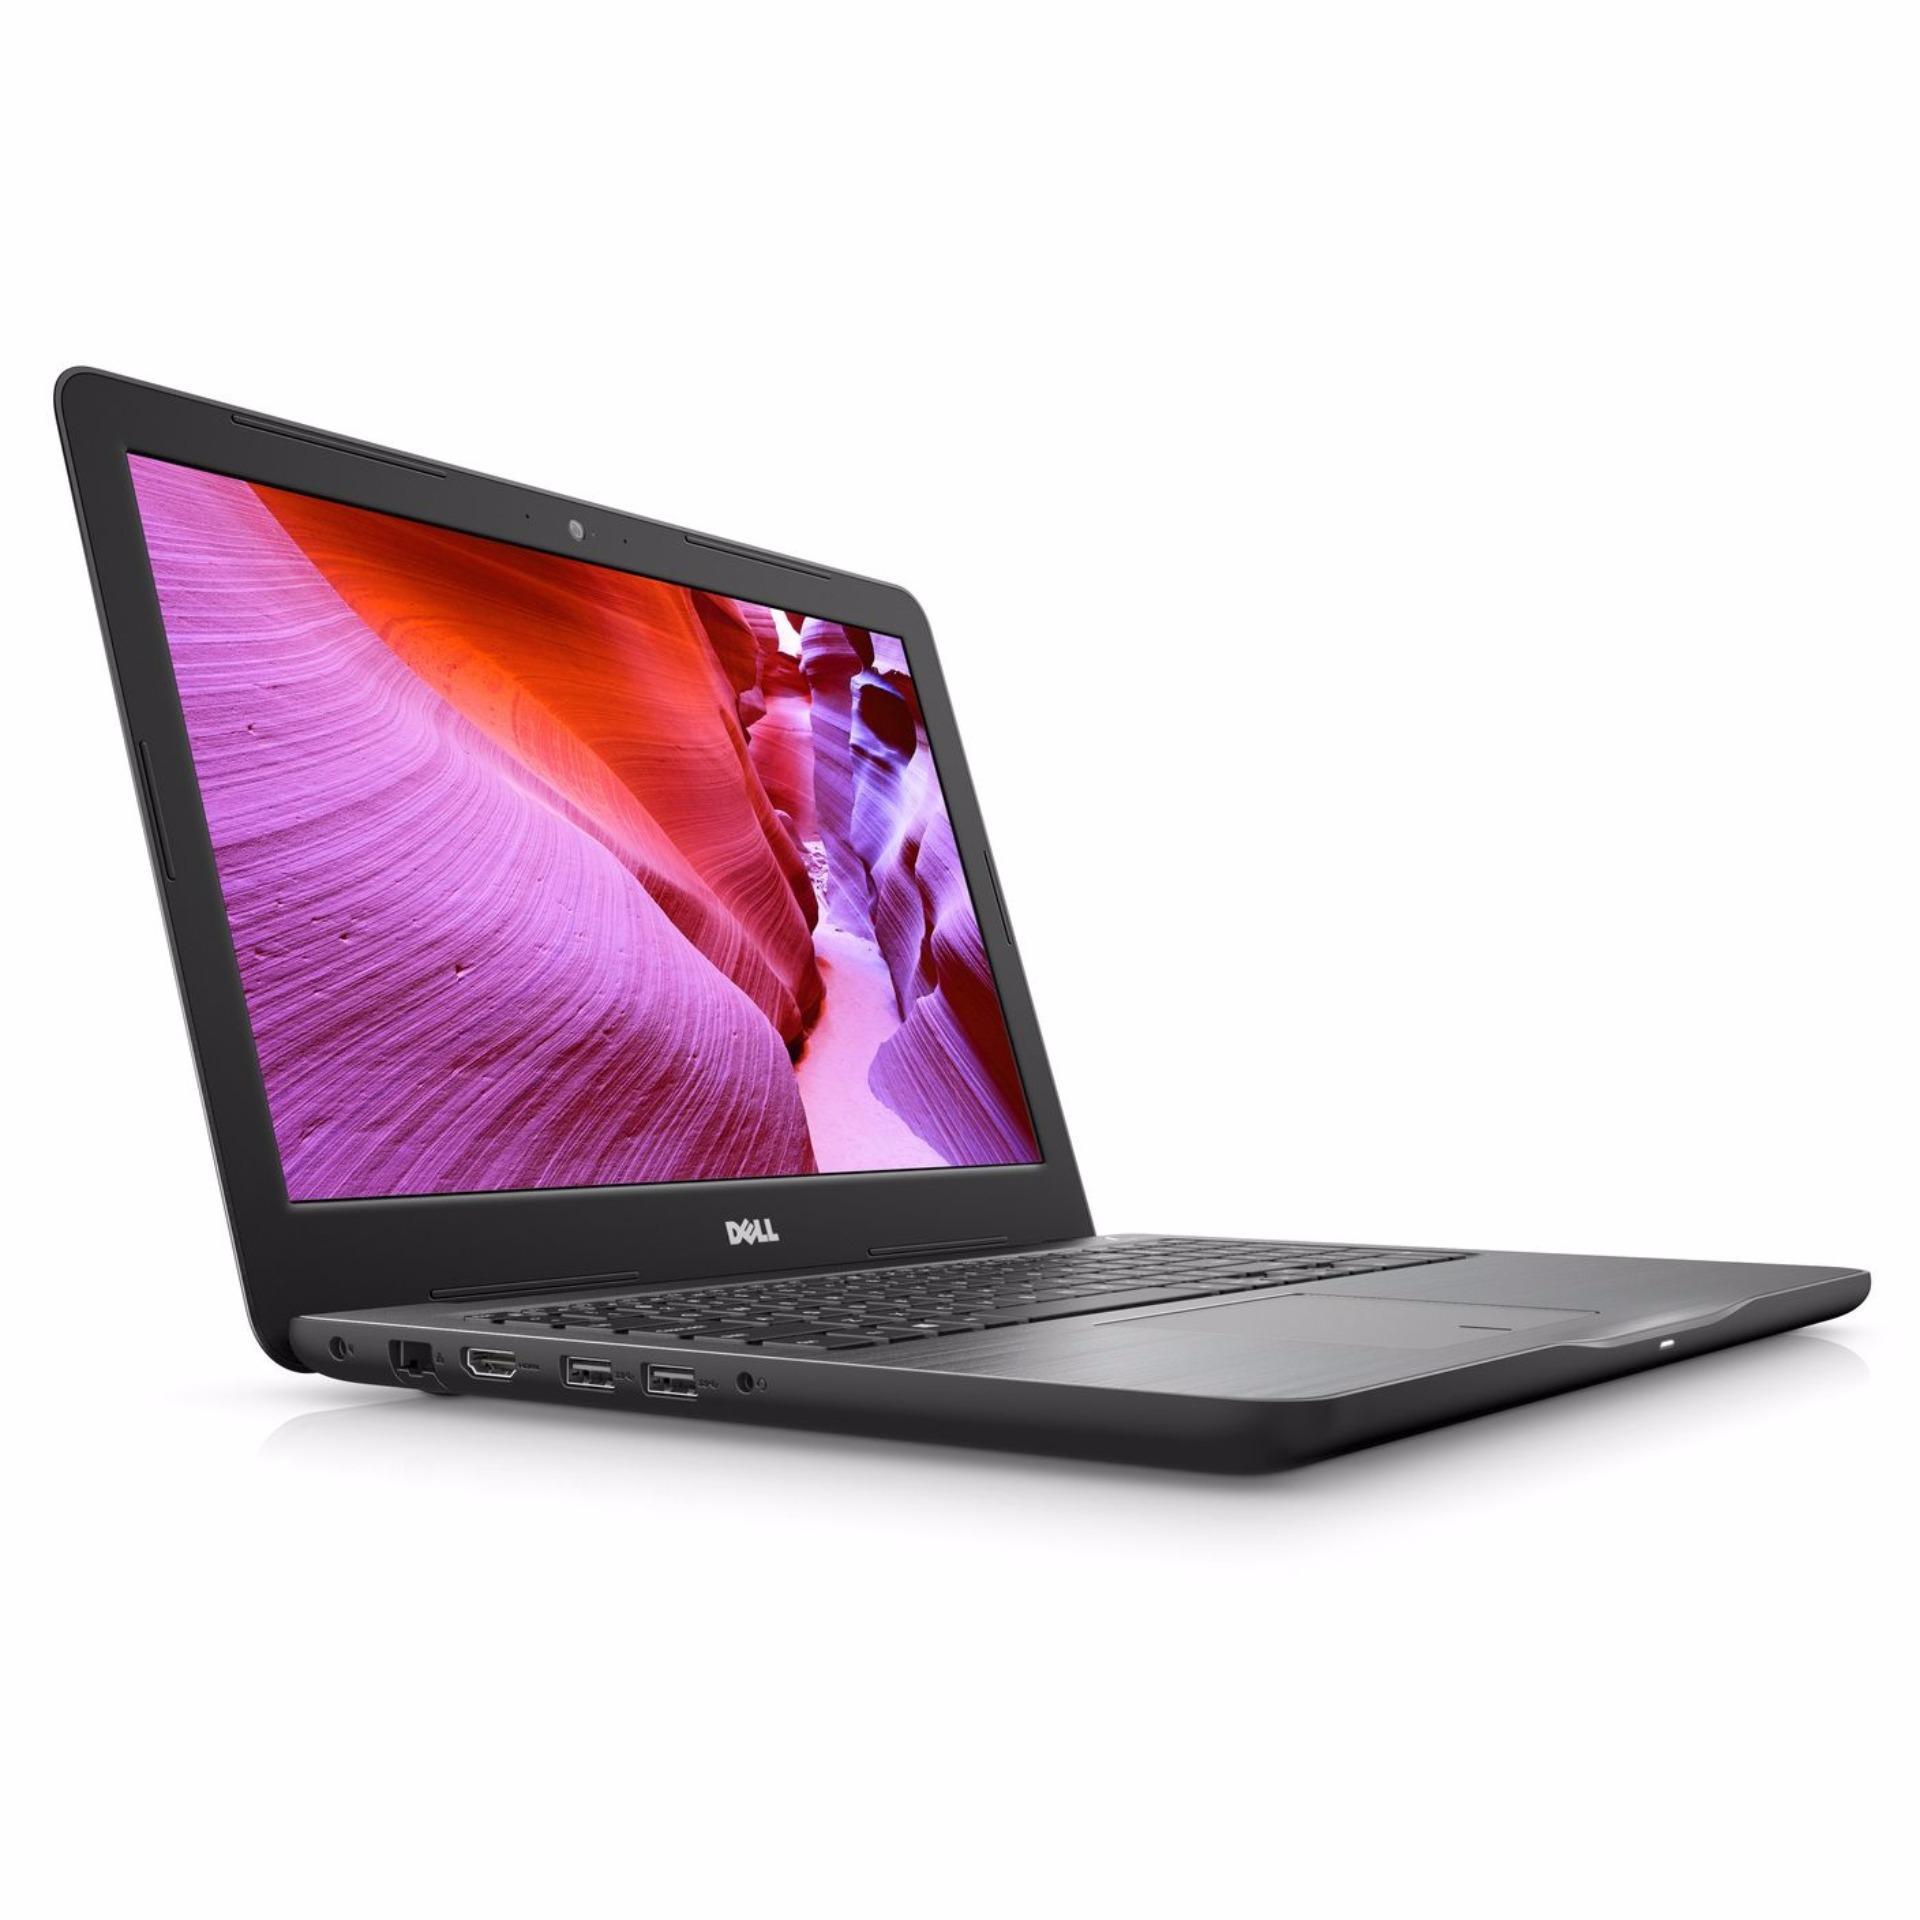 Dell Inspiron Notebook 5567-750824GL (Black) (Intel i7-7500U, 8GB RAM, 256GB SSD, AMD Radeon R7 M445 4GB GDDR5 Graphics, 15.6-inch FHD)